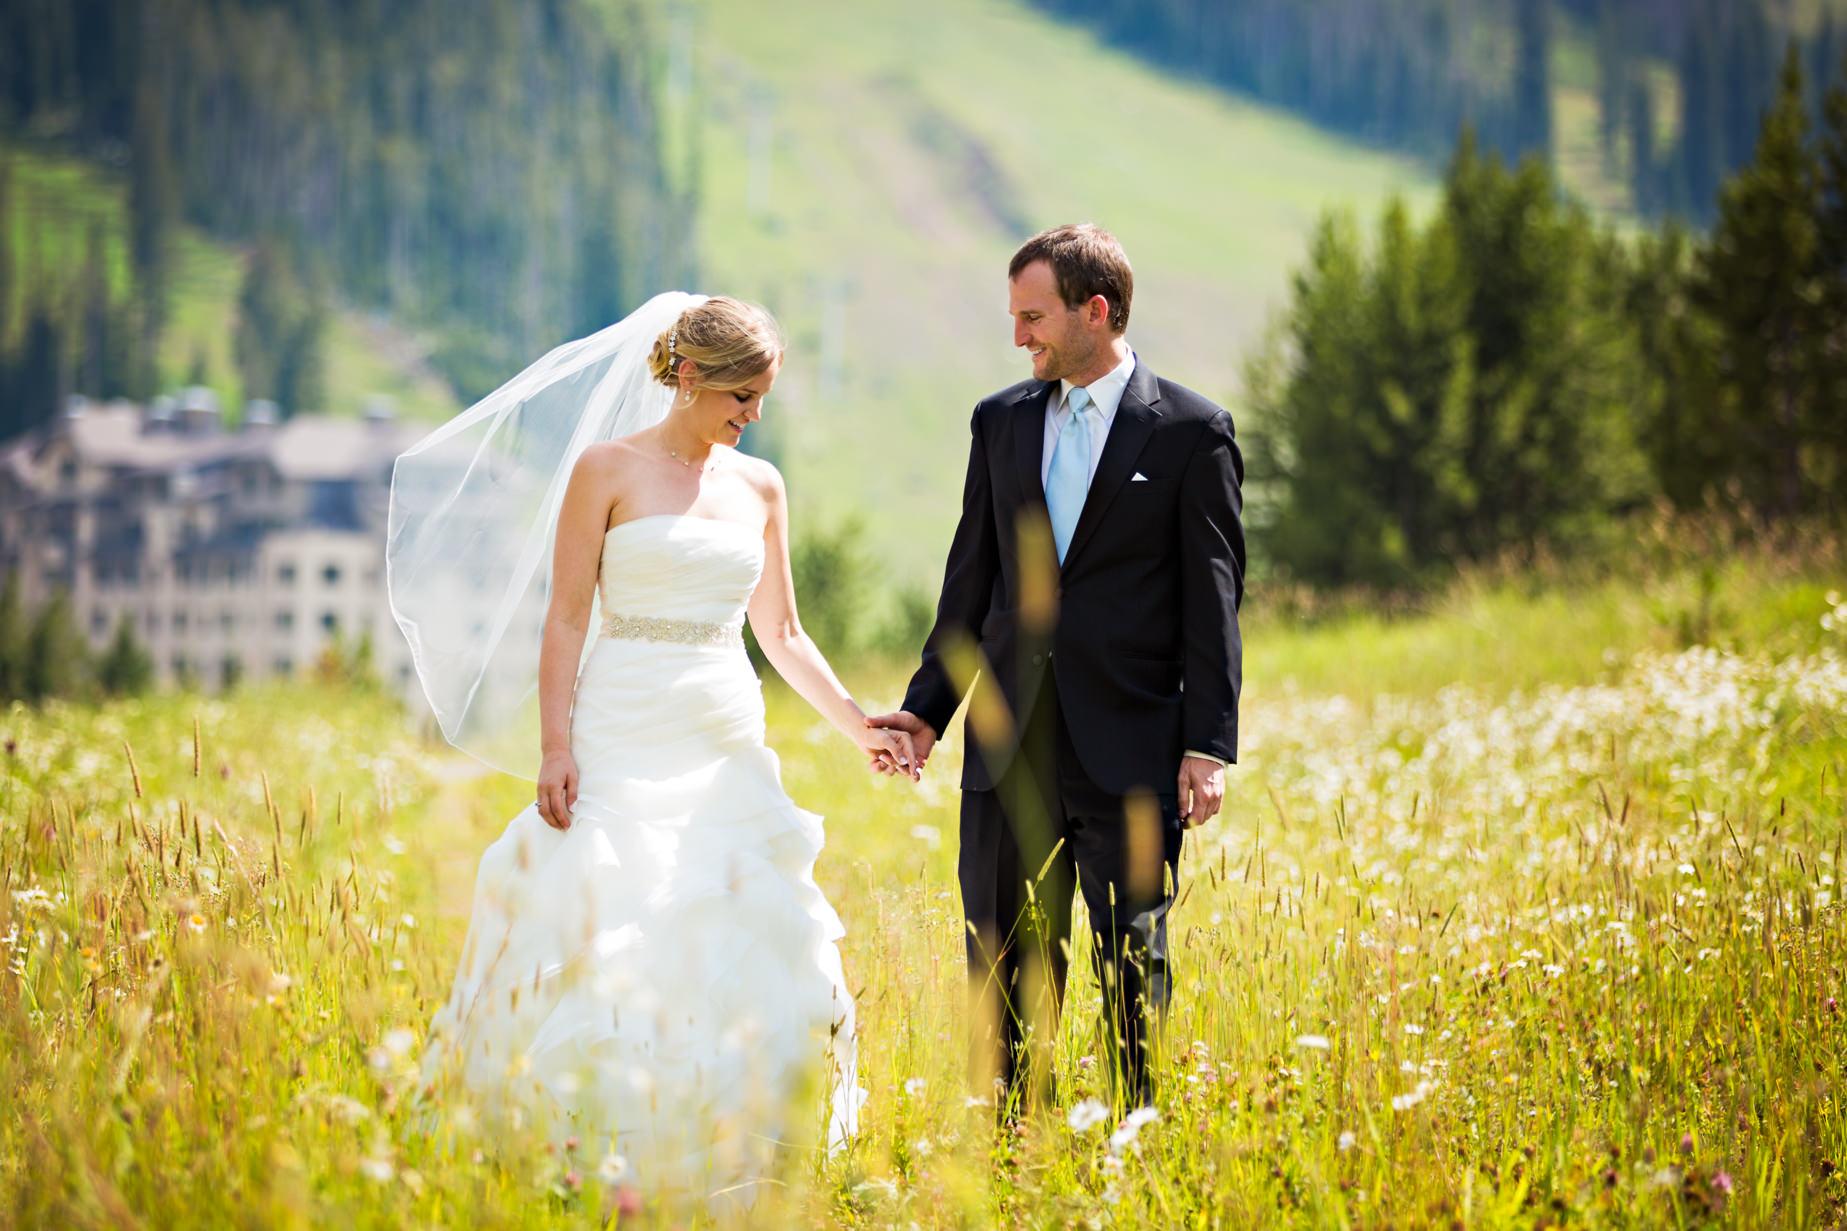 big-sky-resort-wedding-bride-groom-hold-hands-in-field.jpg